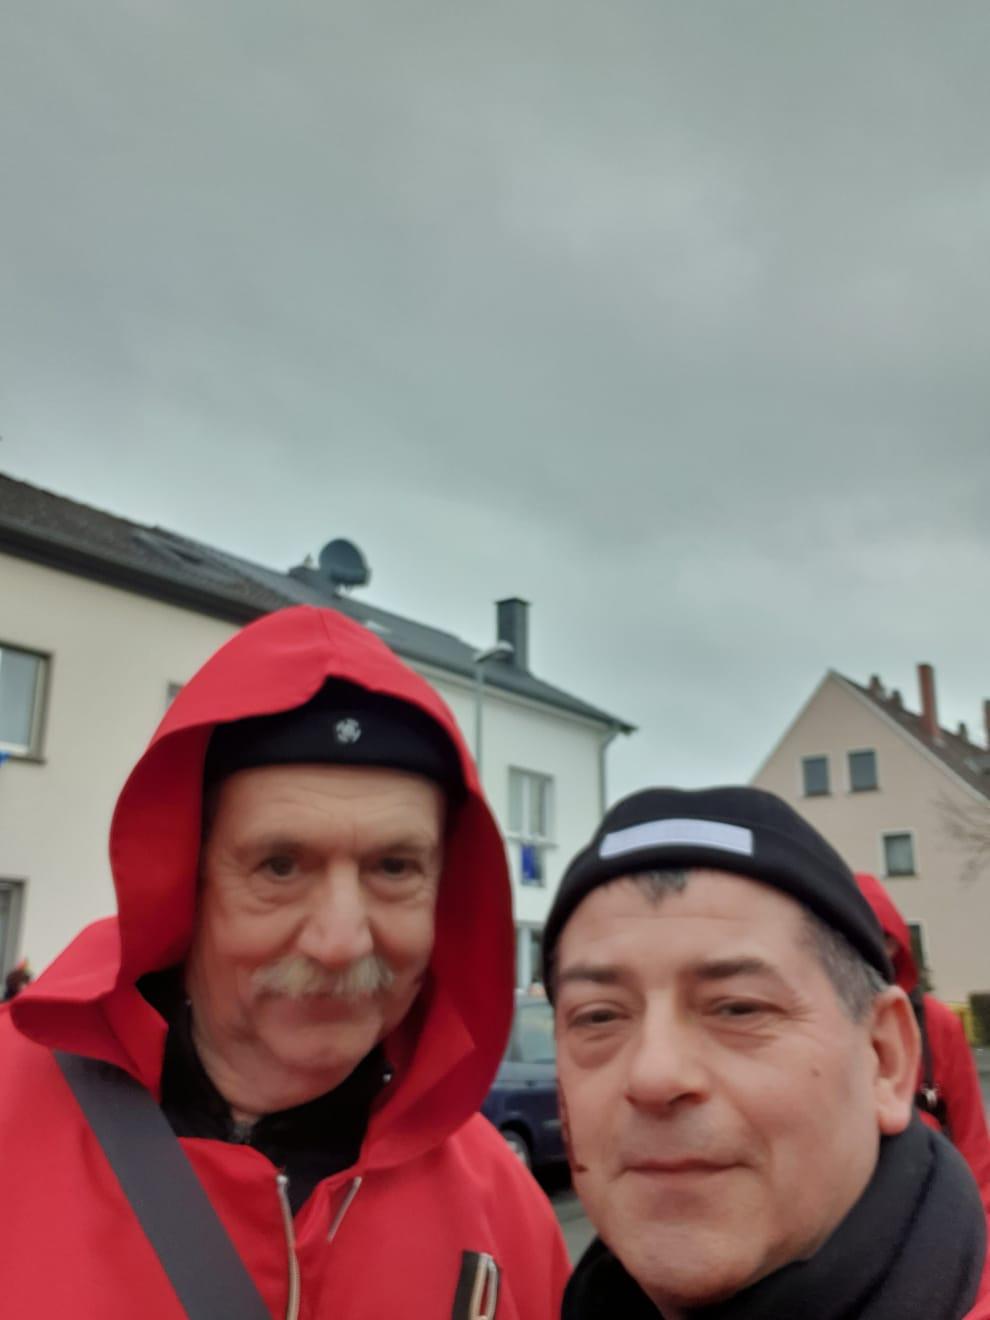 NoName-Guggen-Andernach-2020-Karneval-90